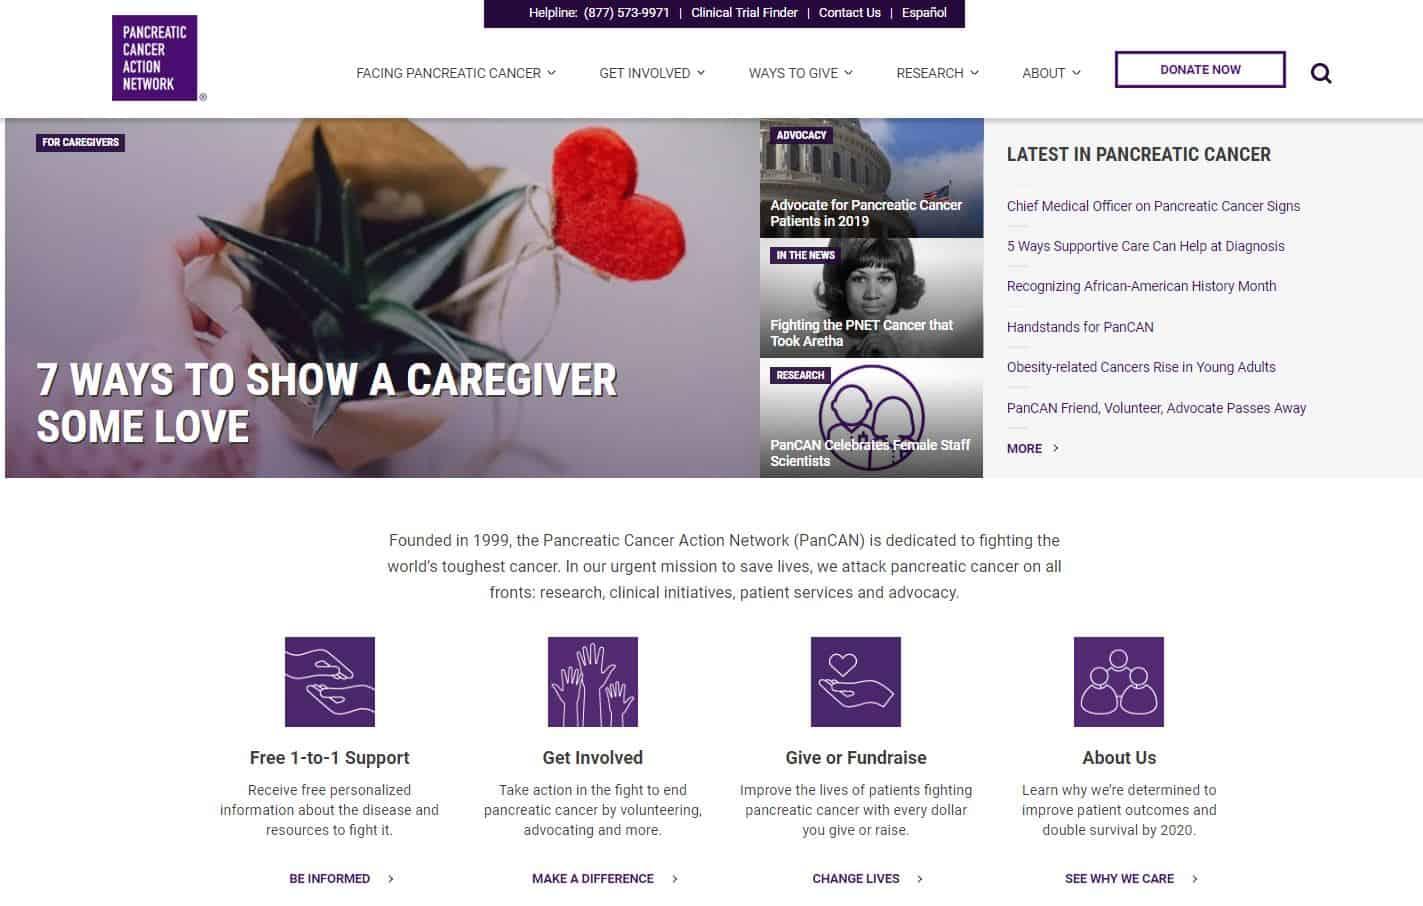 website homescreen of pancreatic cancer patients organisation